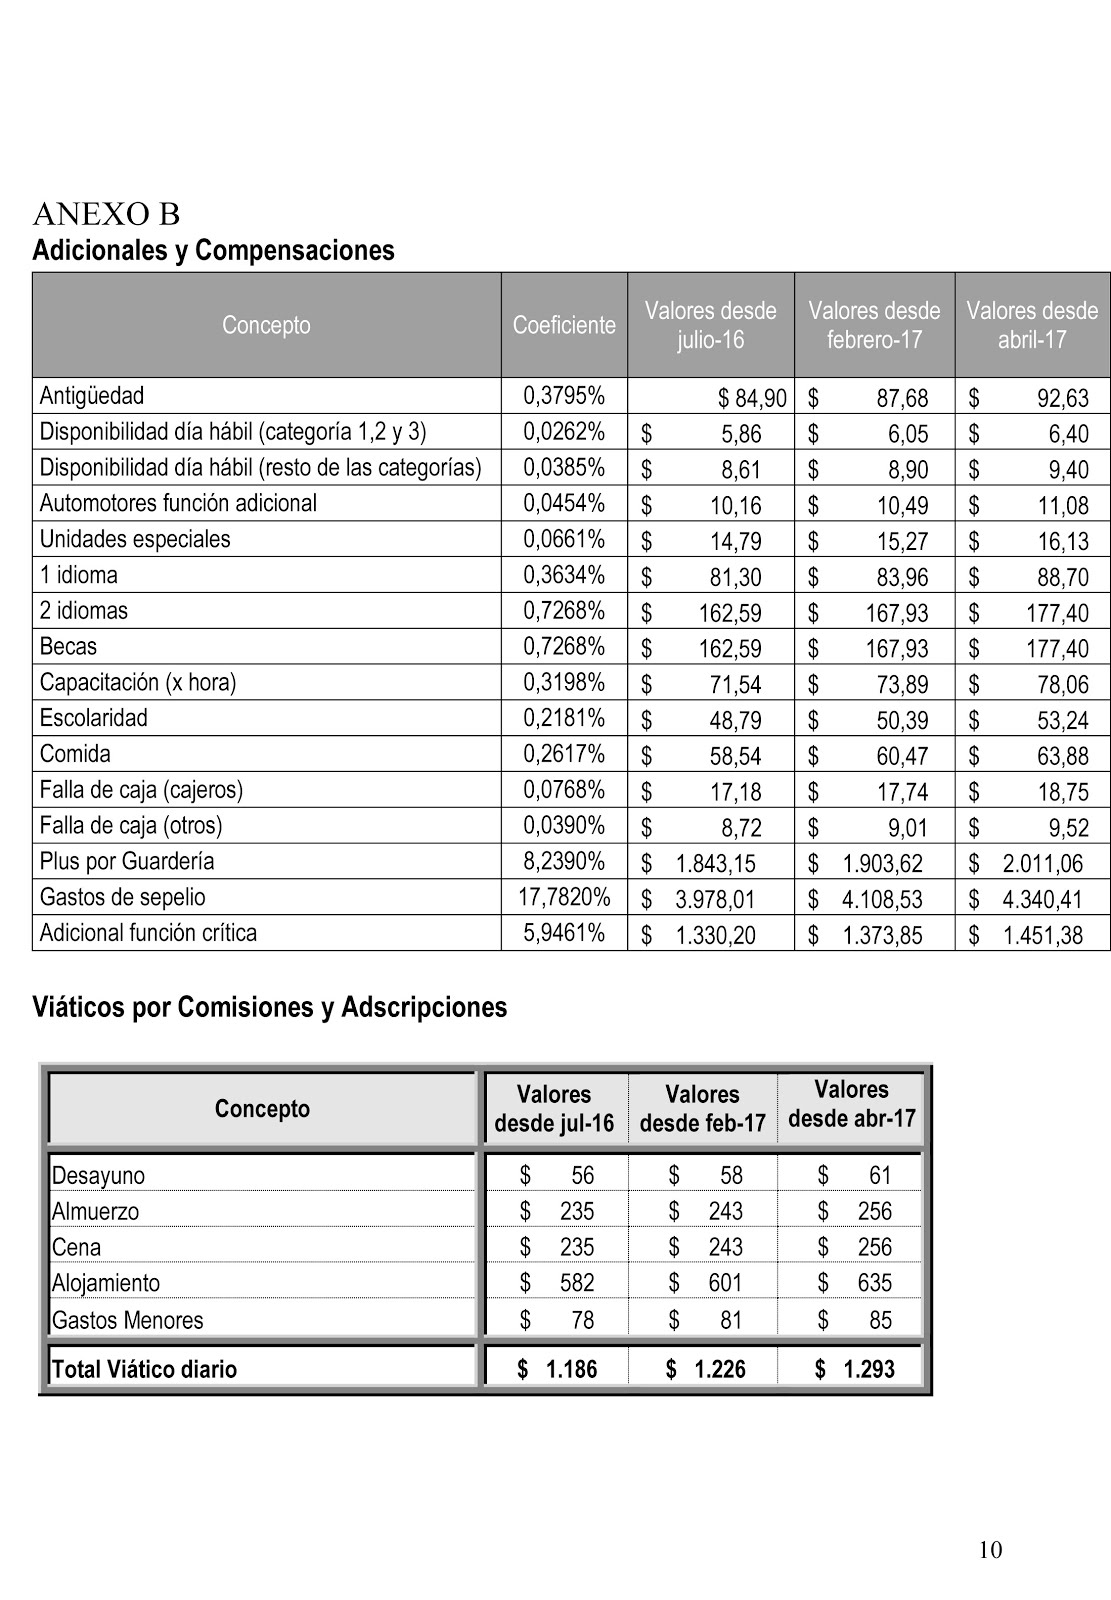 Telefónicos: Acta Acuerdo Salarial: FATEL - TELEFONICA de ARGENTINA